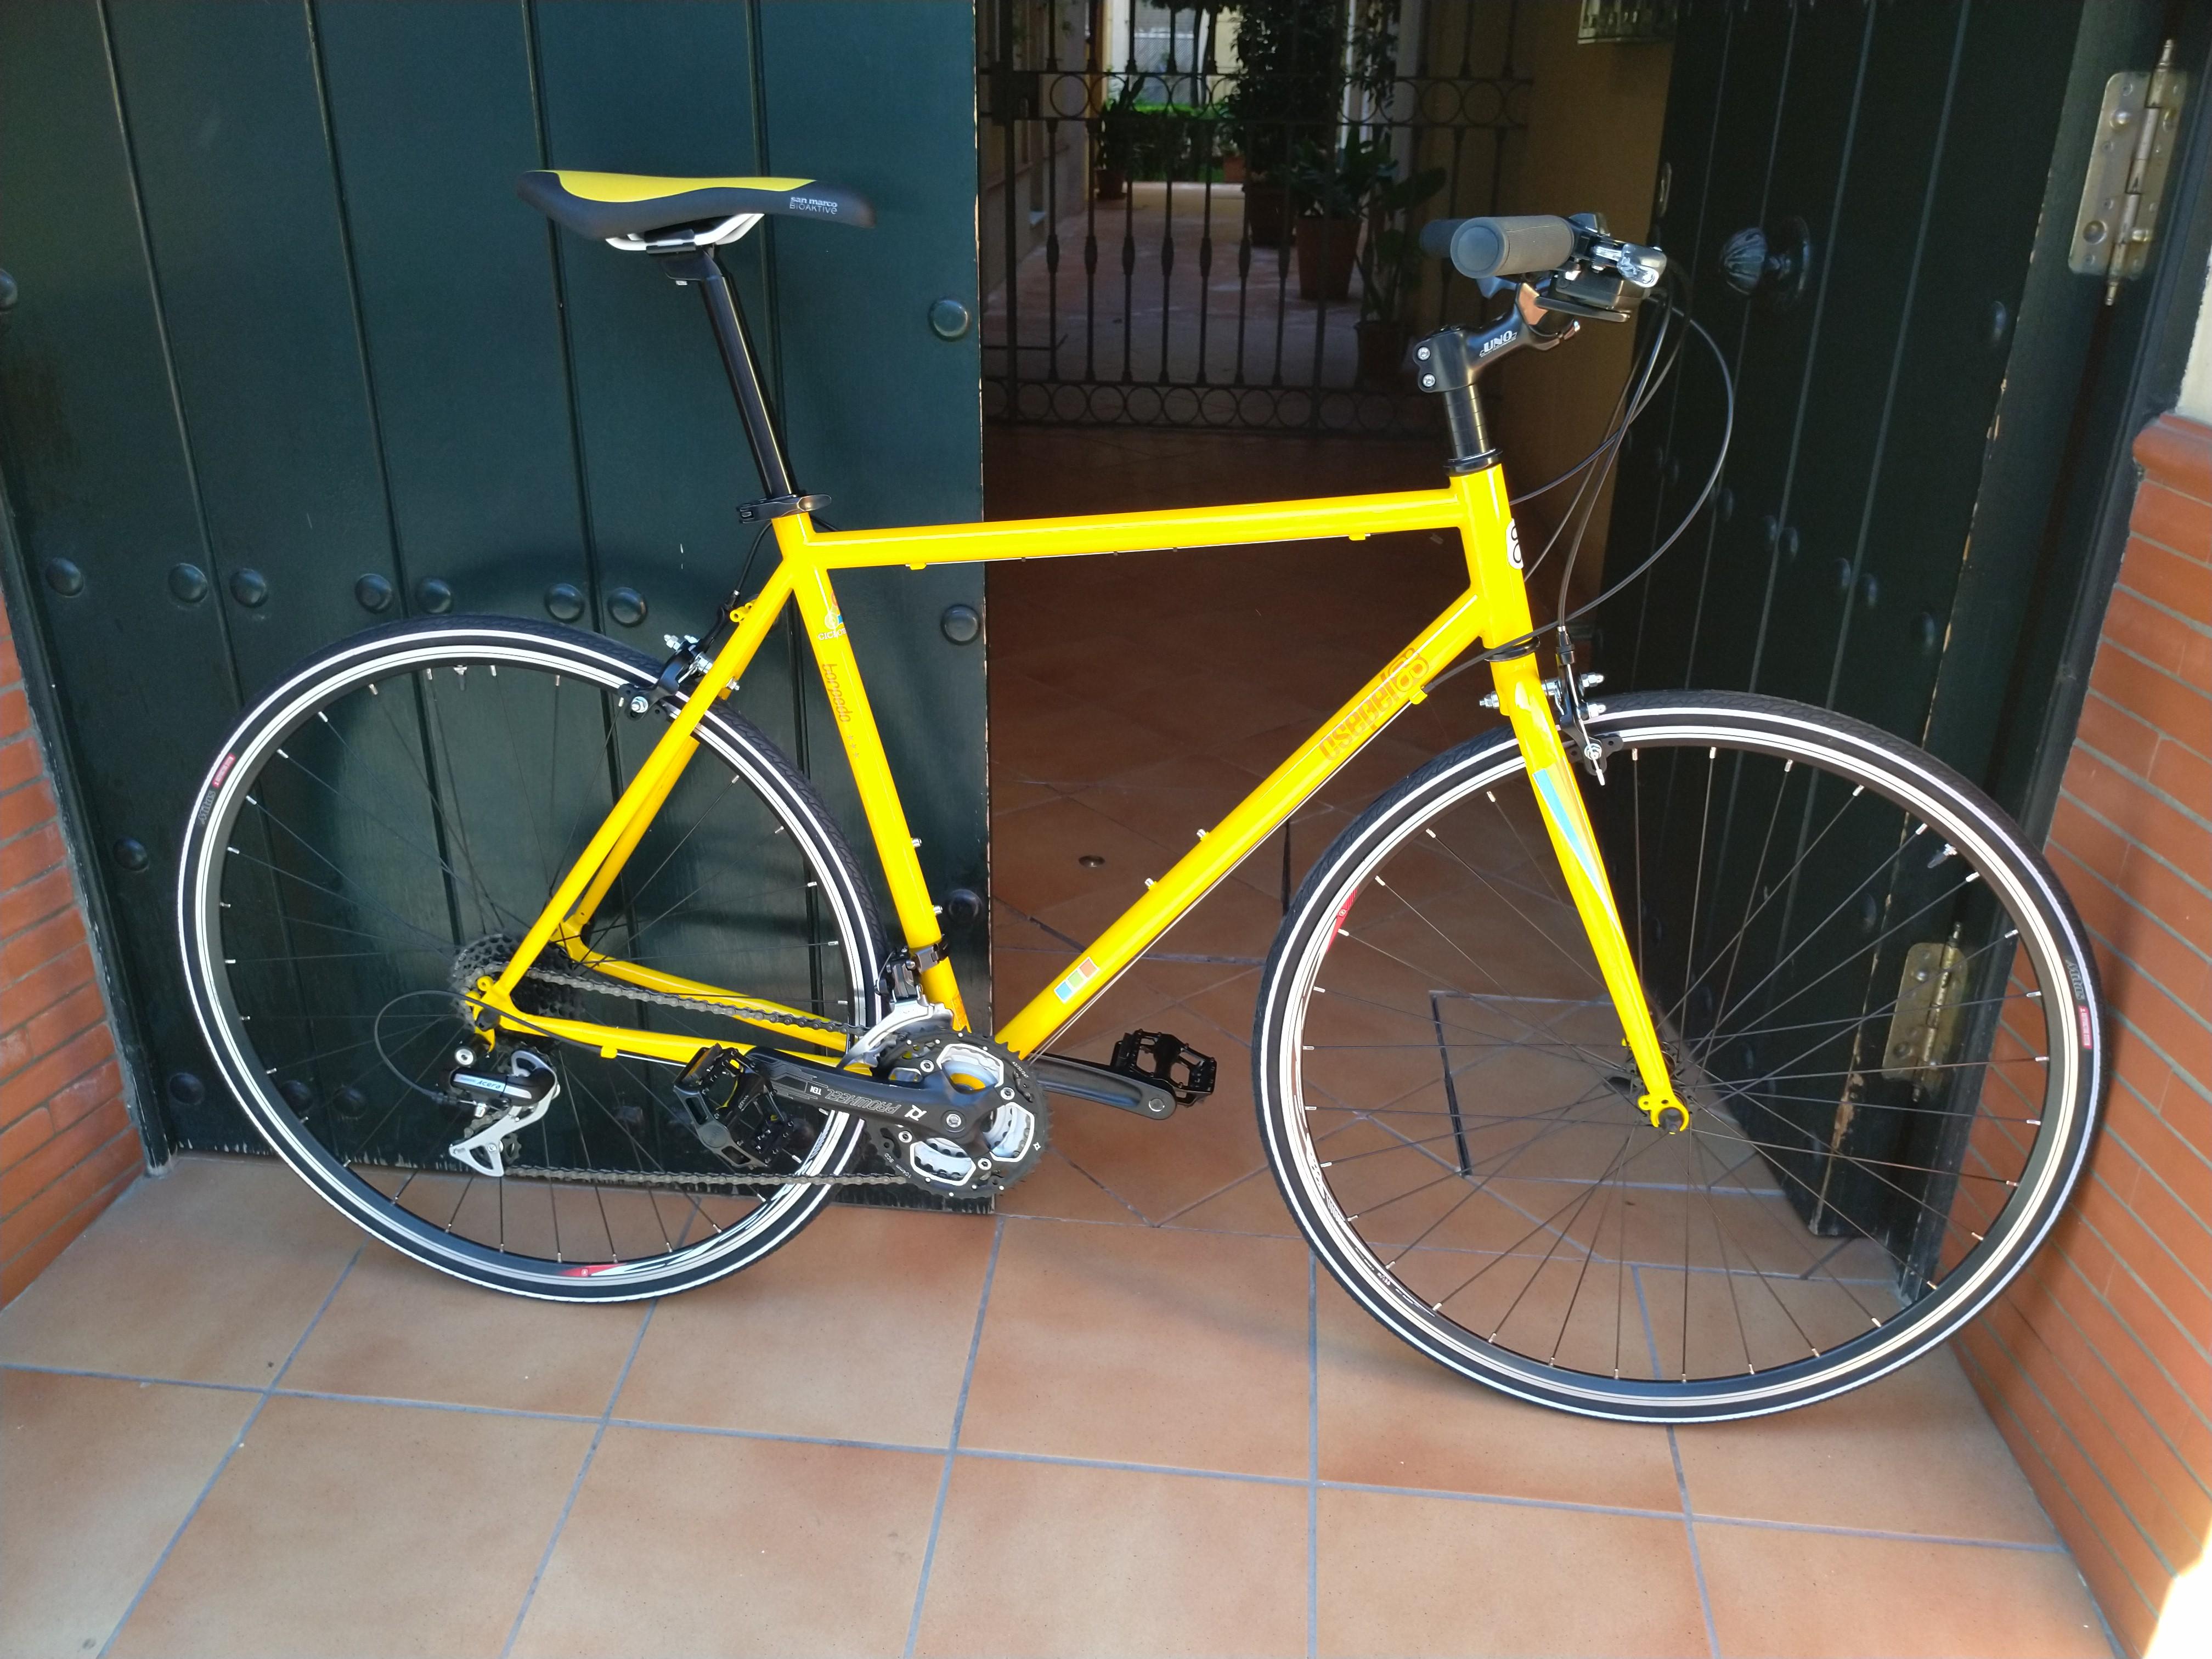 Montaje CRT-Paseo amarilla y negra